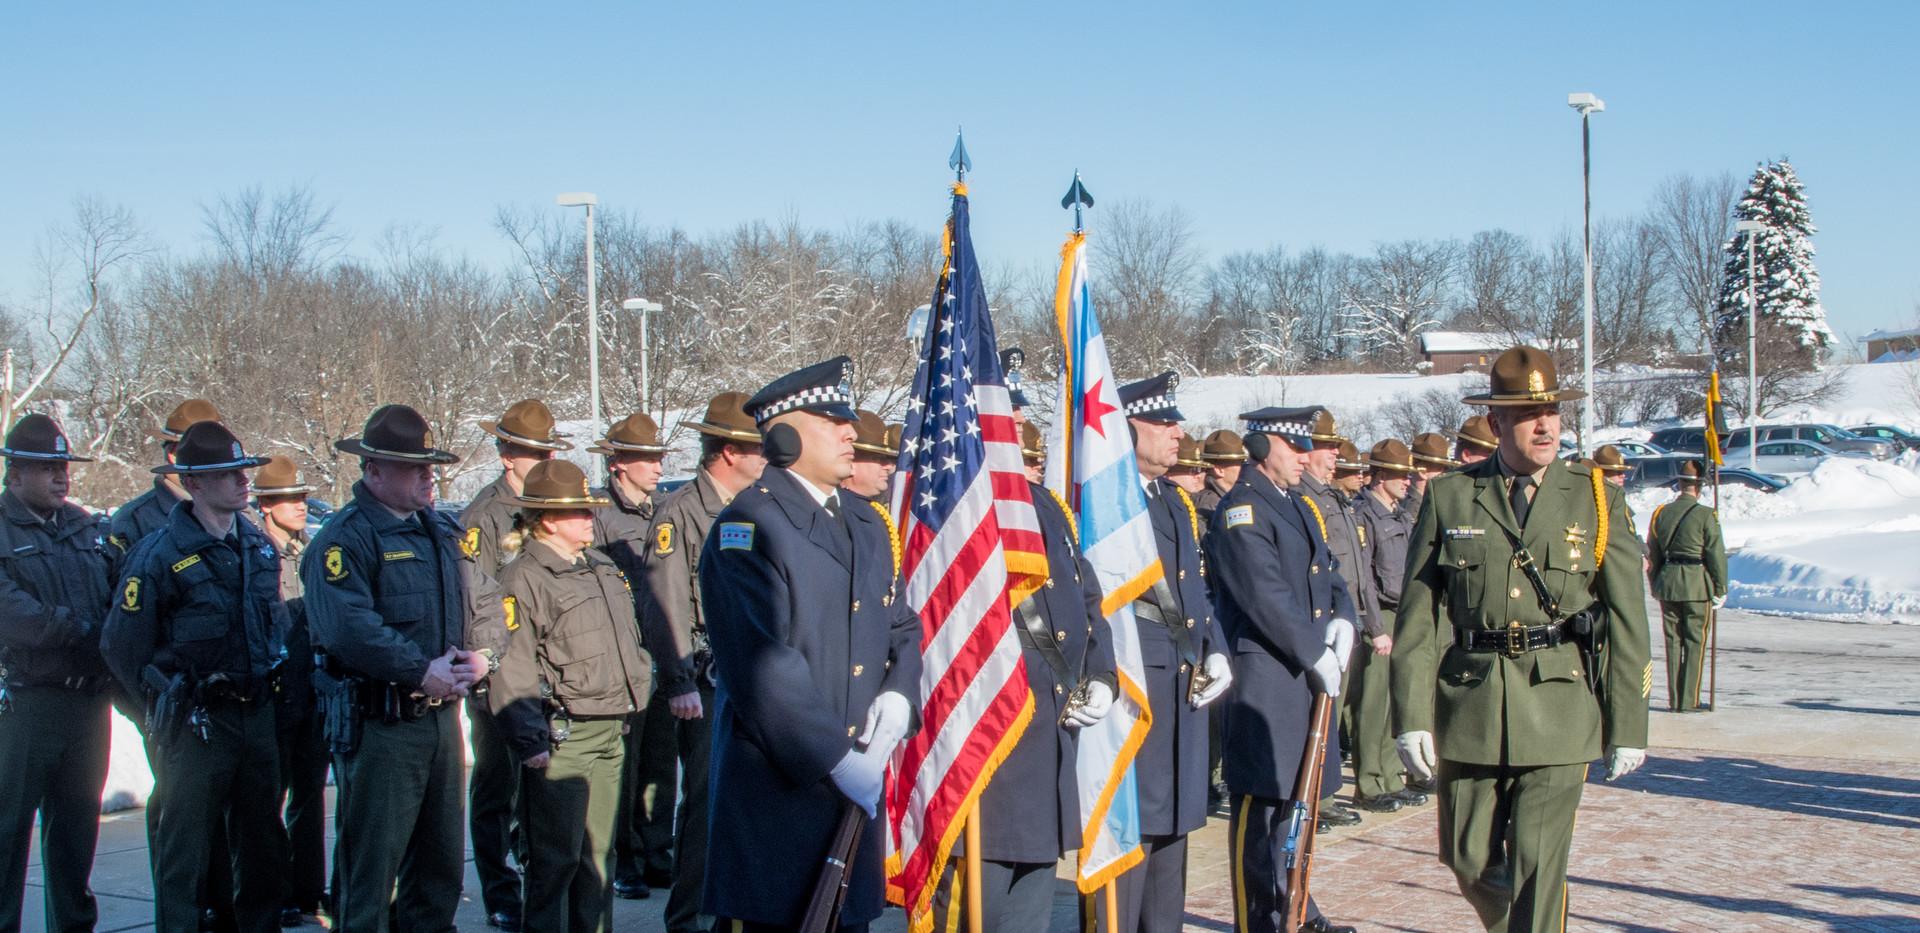 Lt. Rich Kozik Memorial Illinois State Police